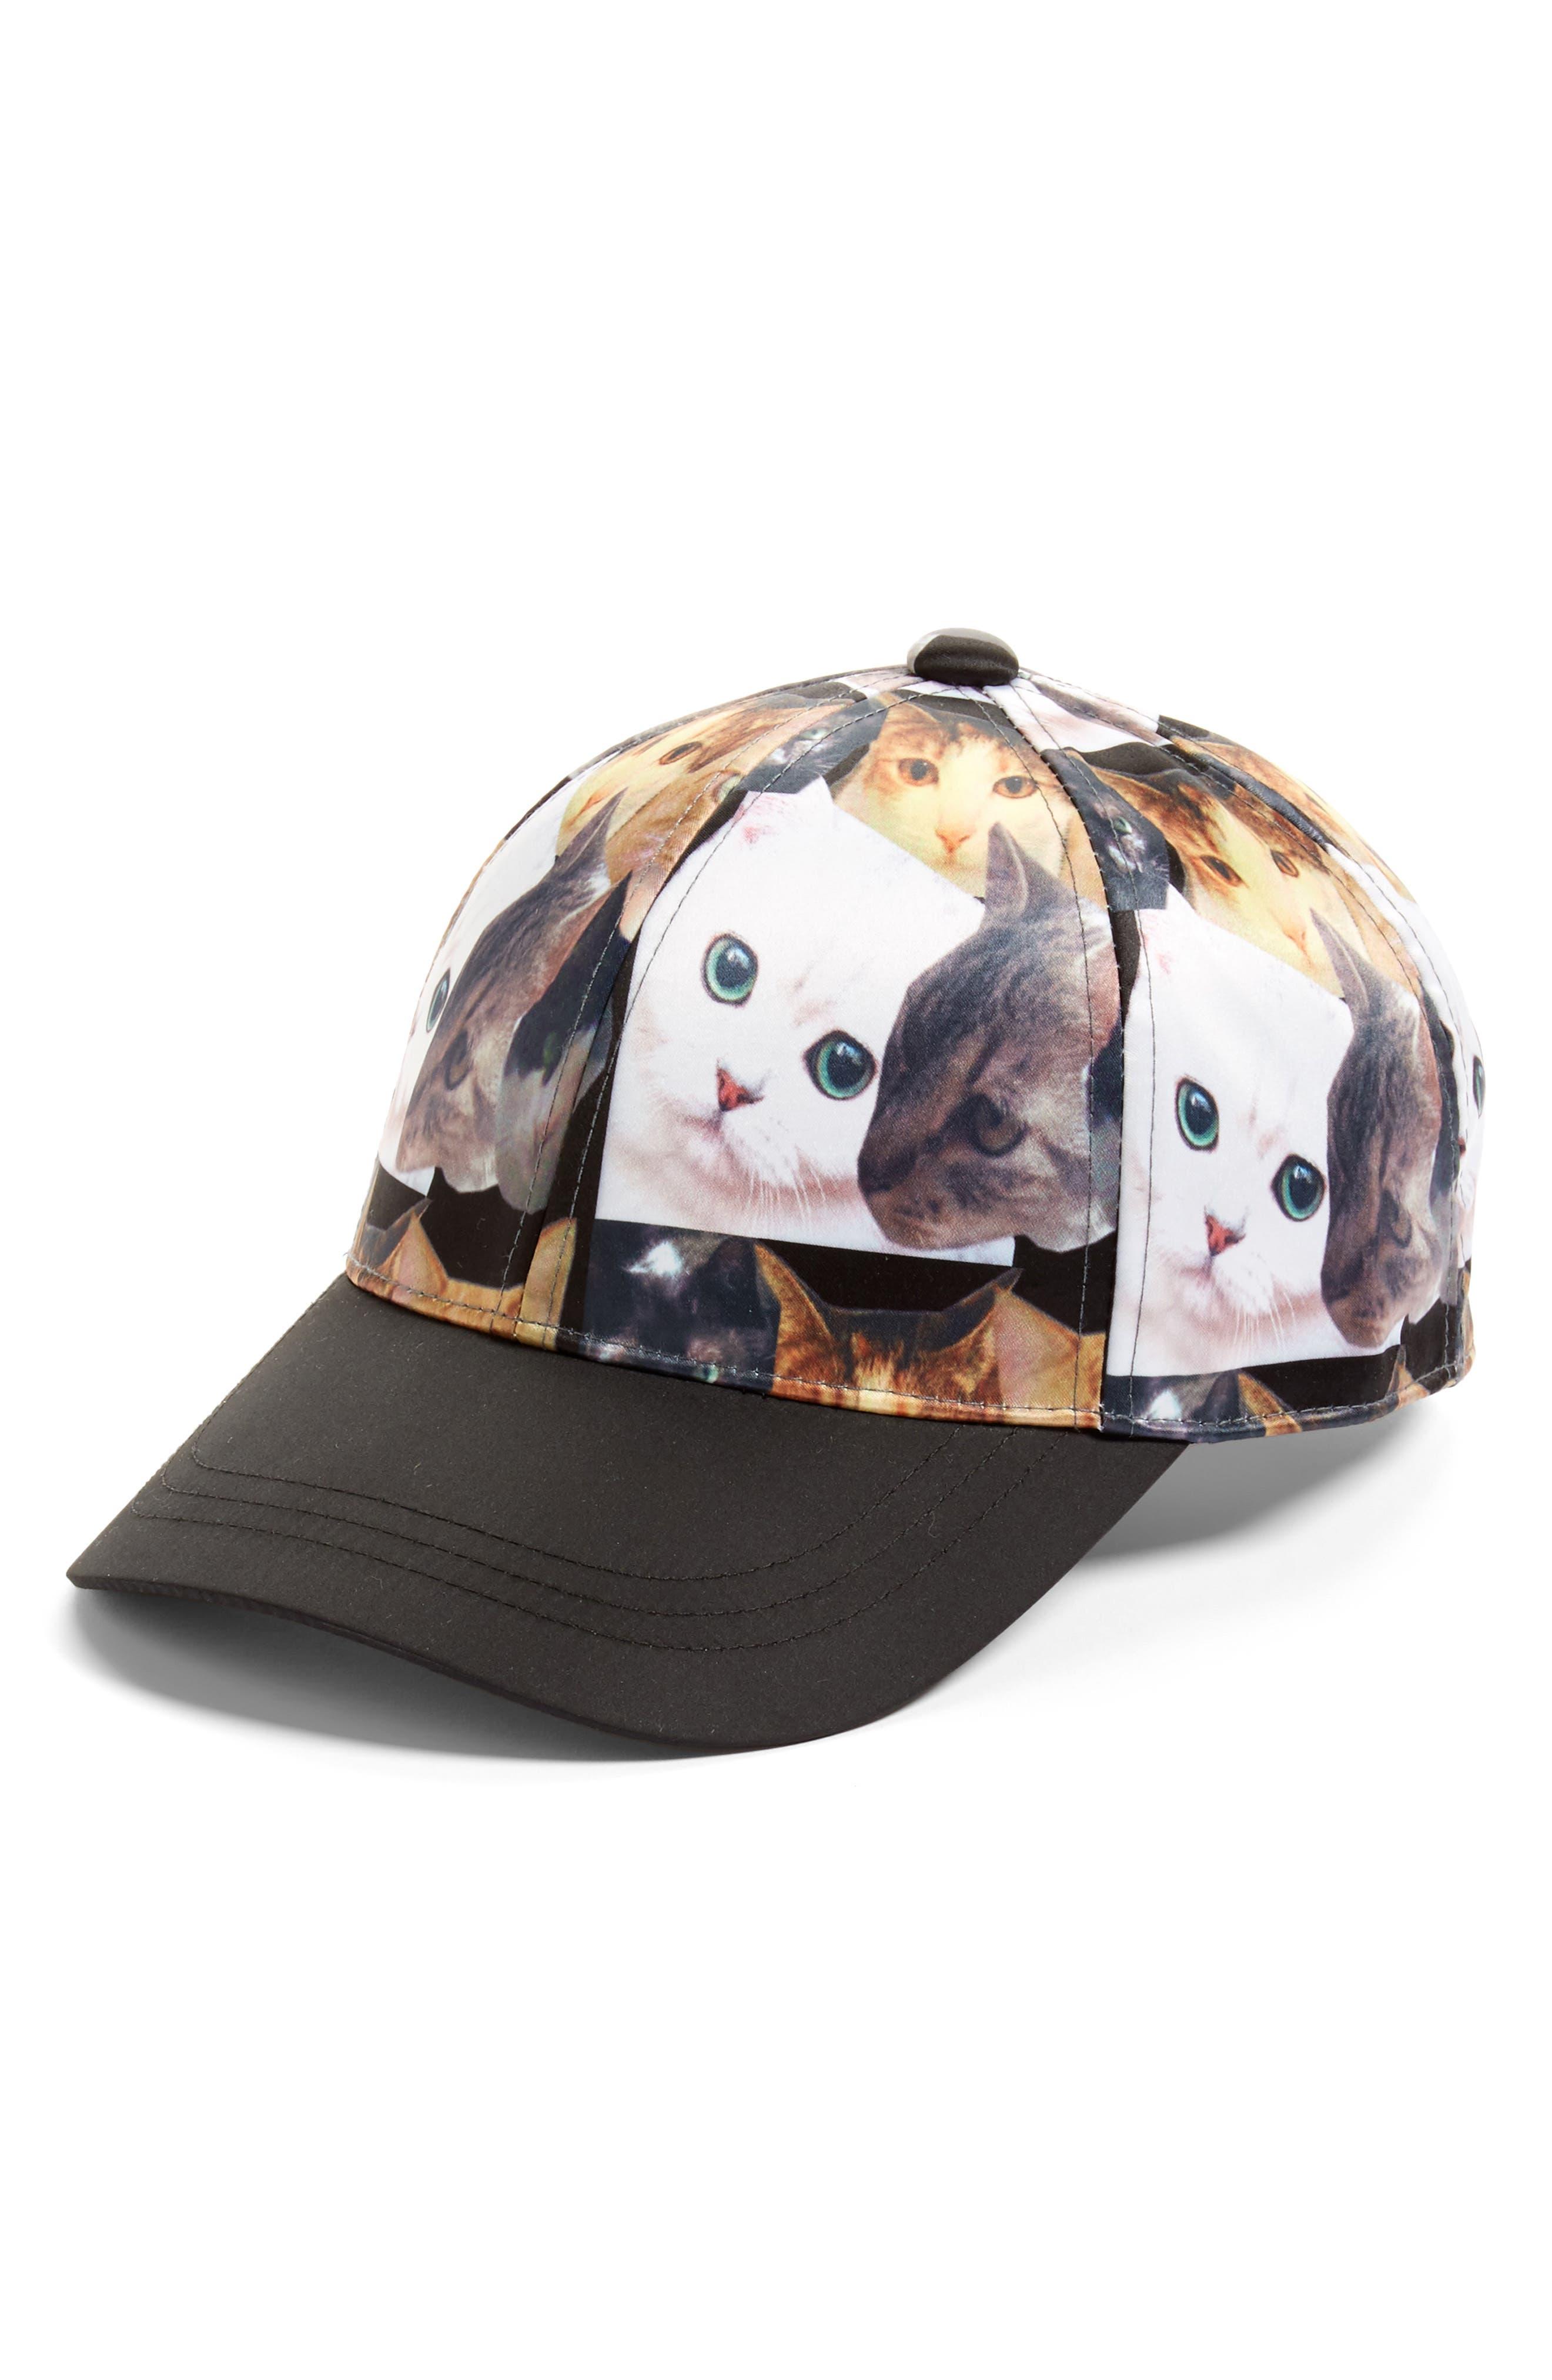 August Hat Cat Collage Baseball Cap